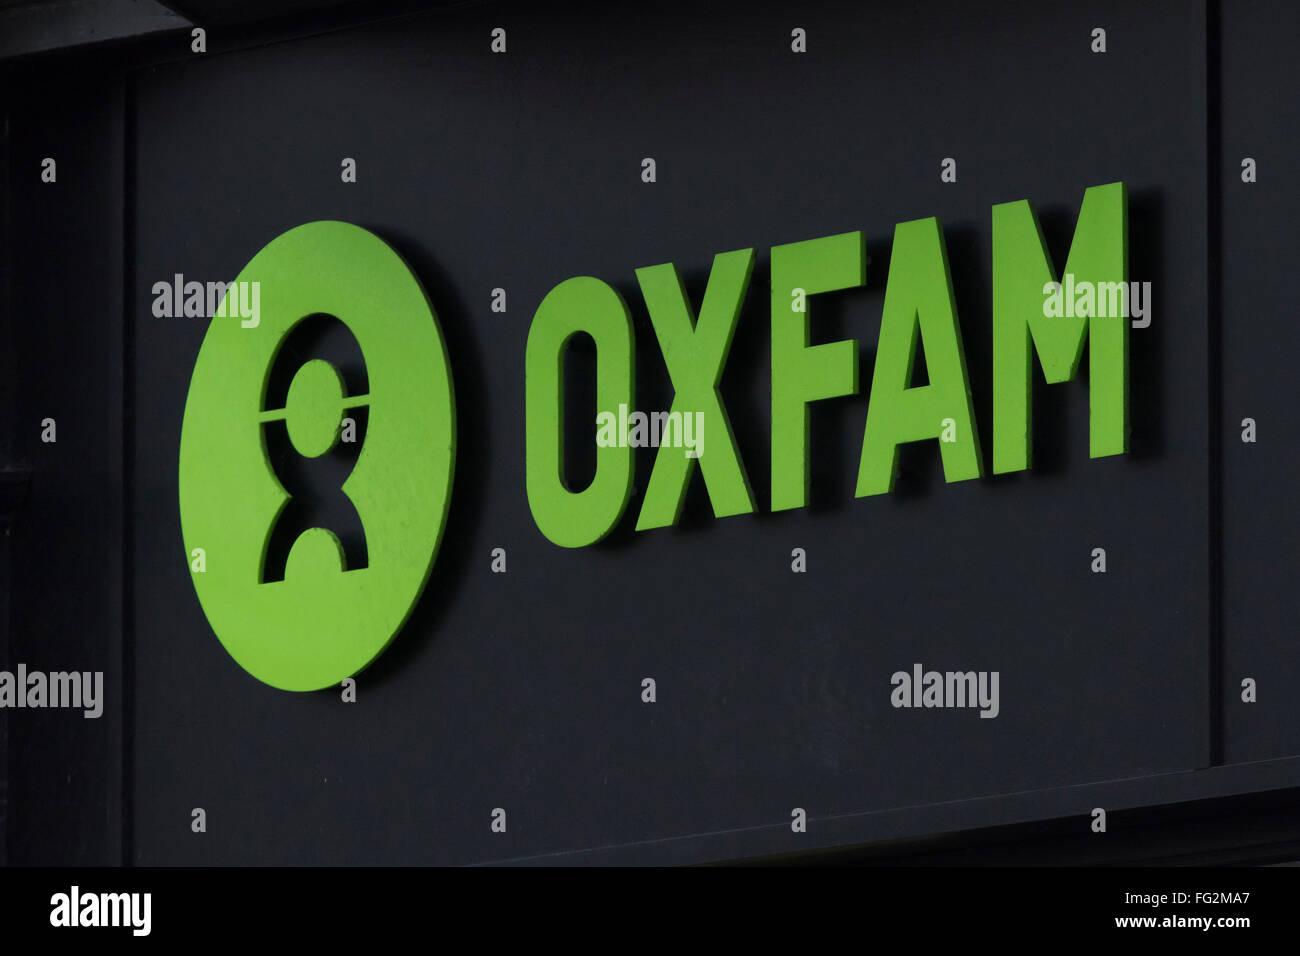 Oxfam-Charity-Zeichen-logo Stockbild